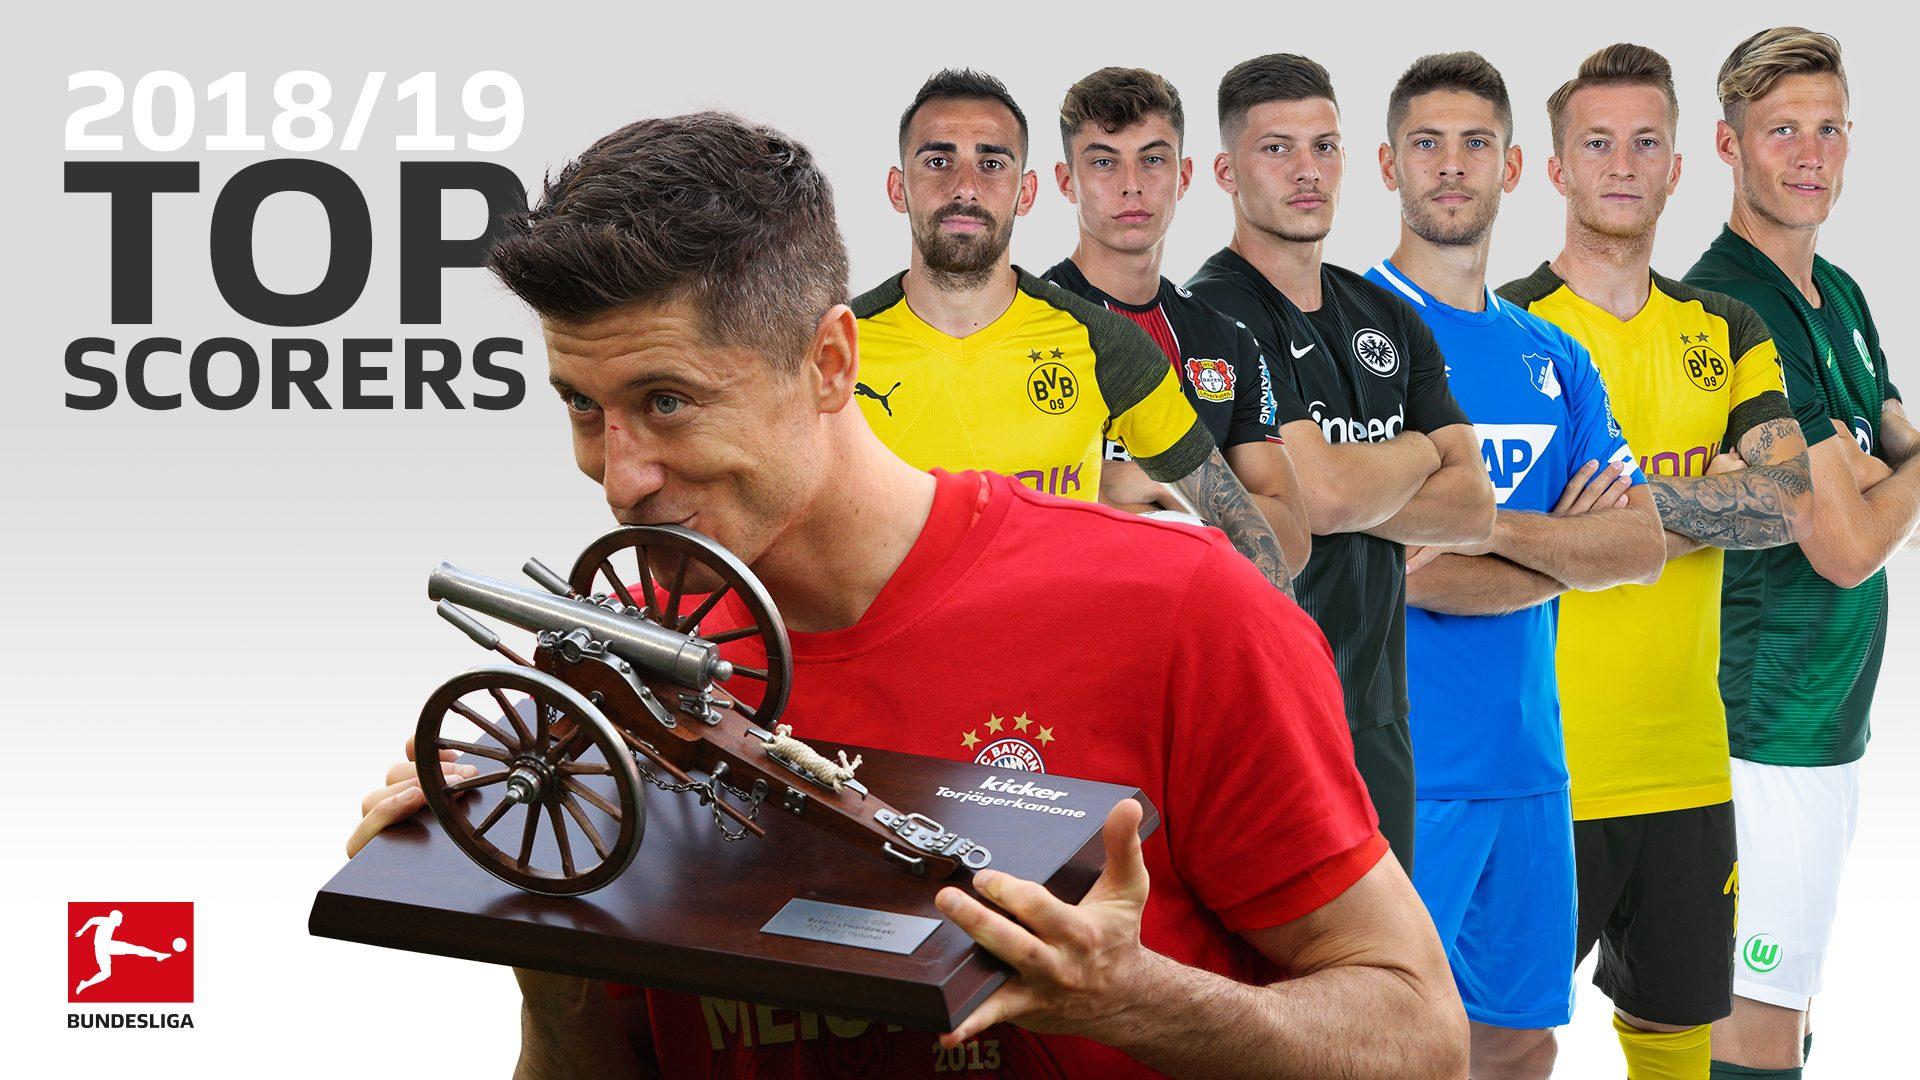 Bundesliga | Bundesliga top scorer 2018/19: Who were the league's